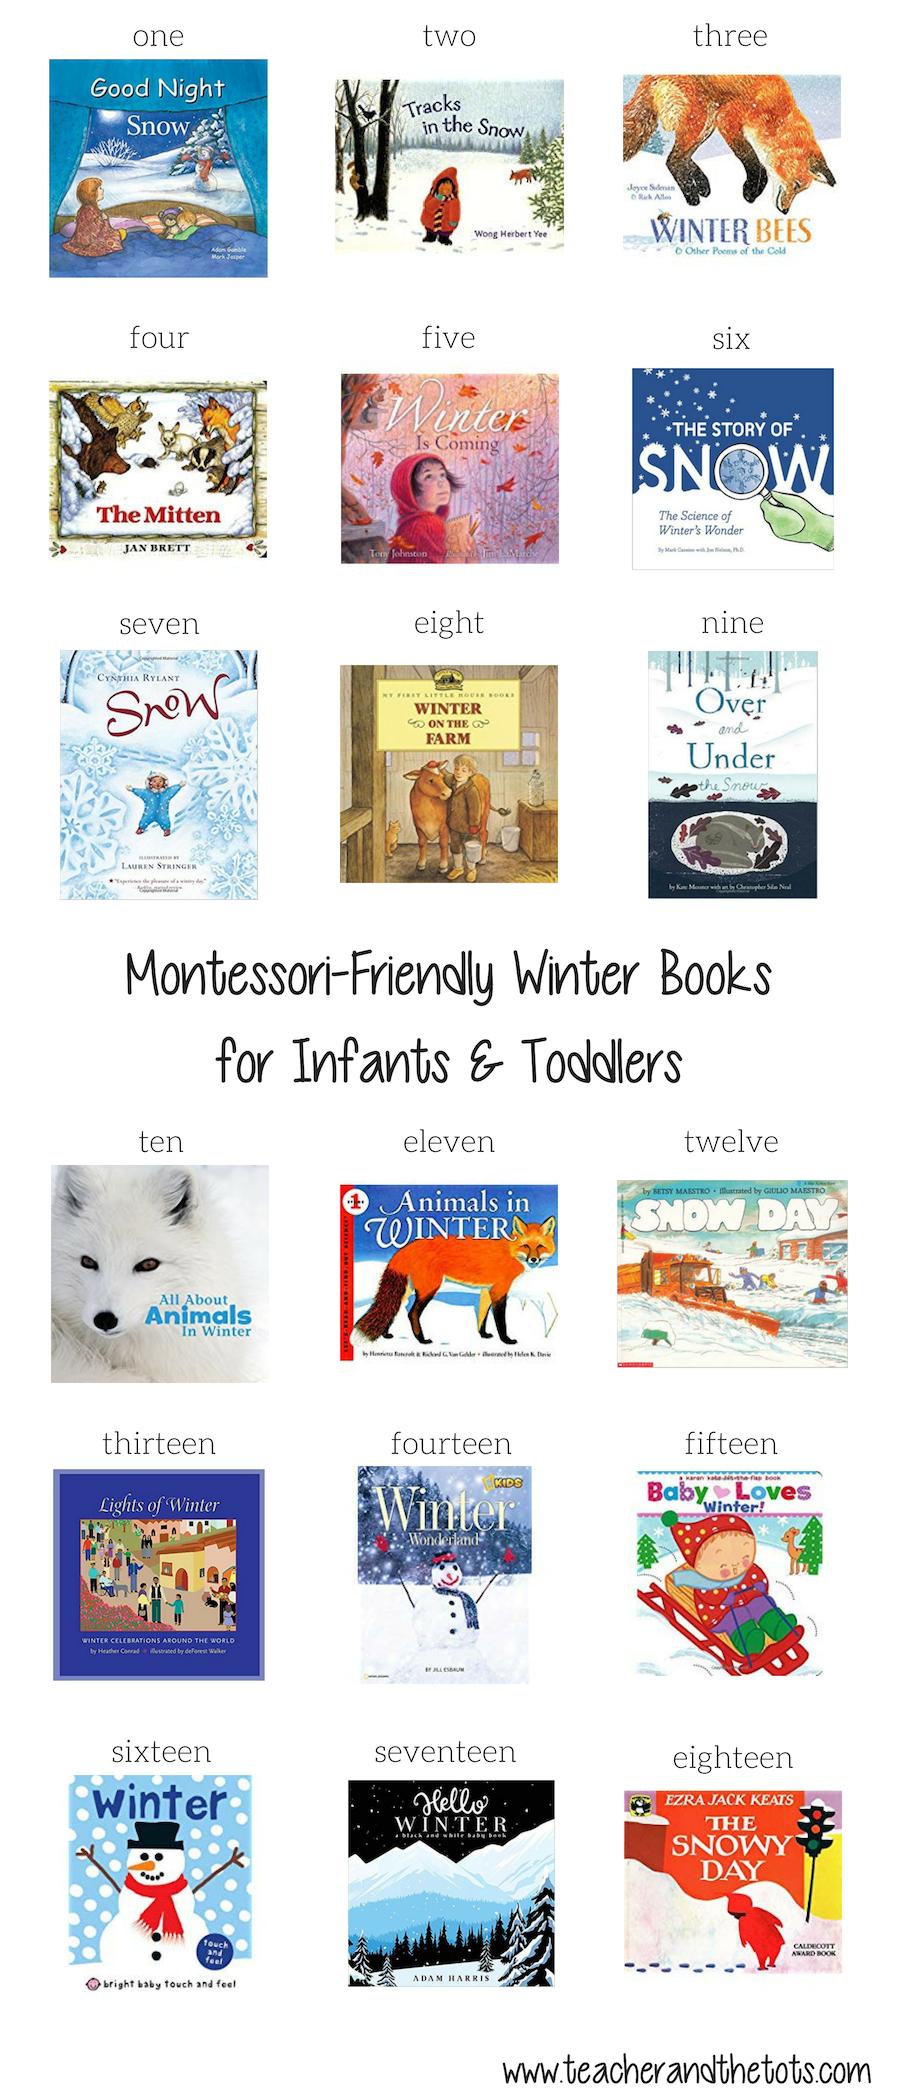 Montessori-Friendly Winter Books - Teacher and the Tots